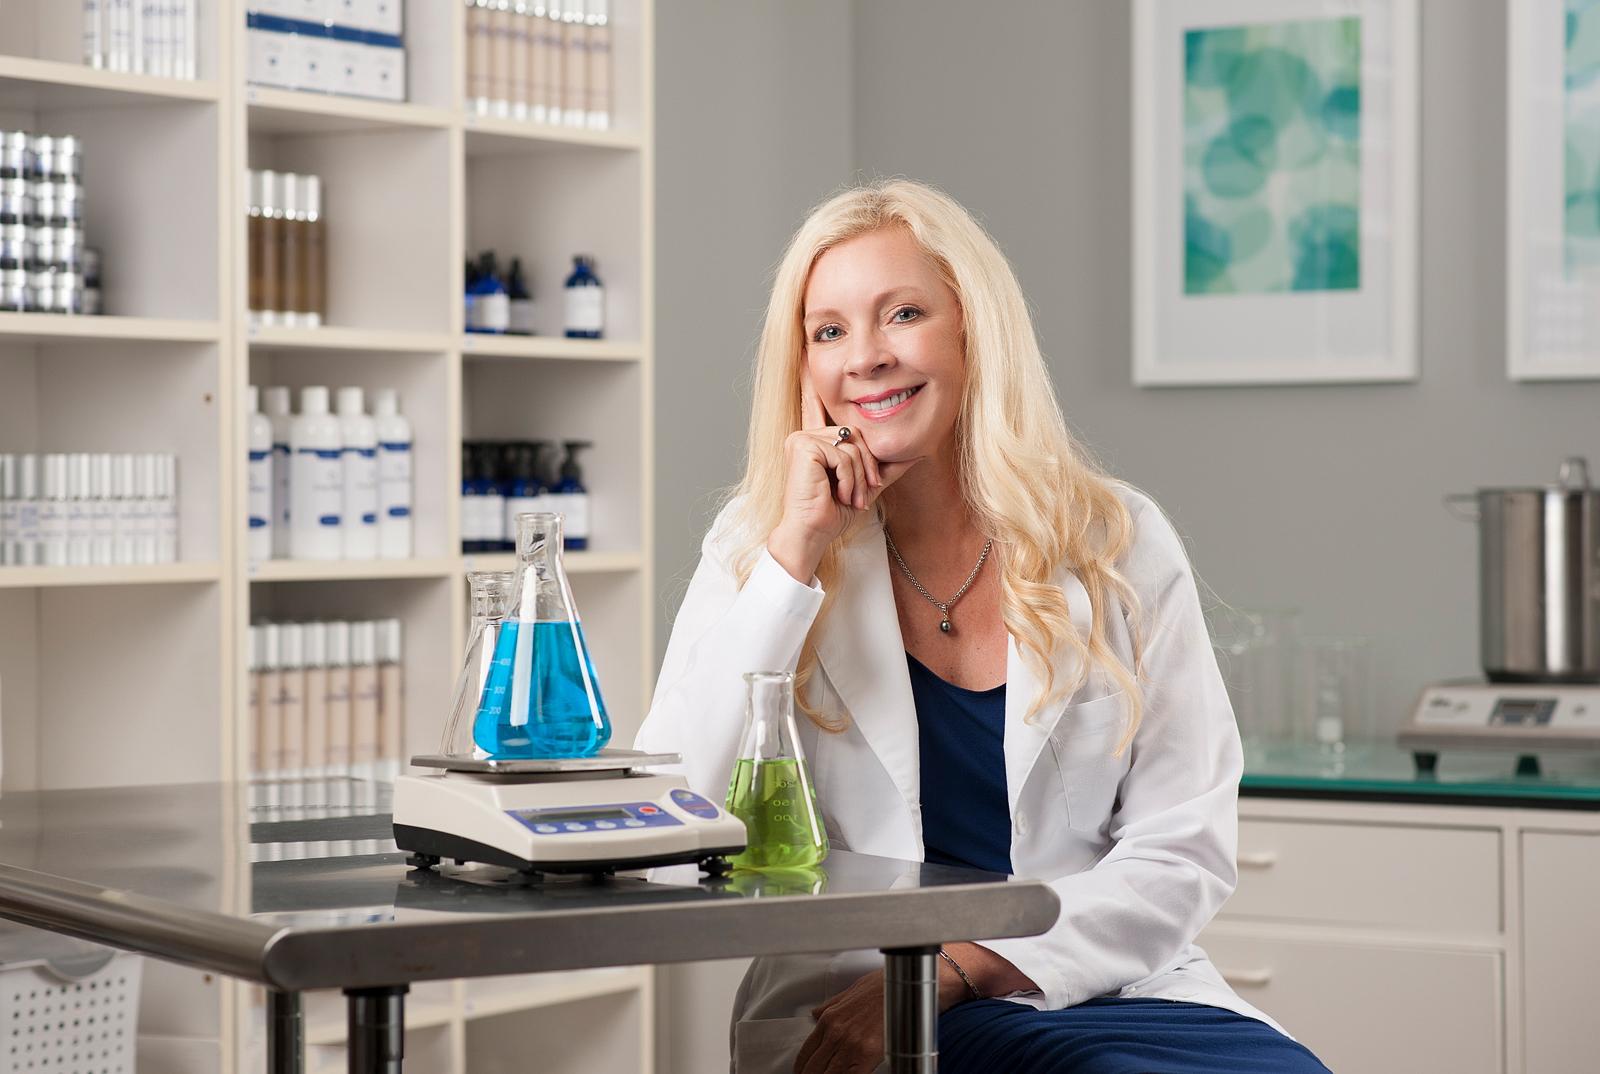 10-beautiful-woman-chemist-scientist-doctor-professional-magazine-feature-branding-fort-myers.jpg